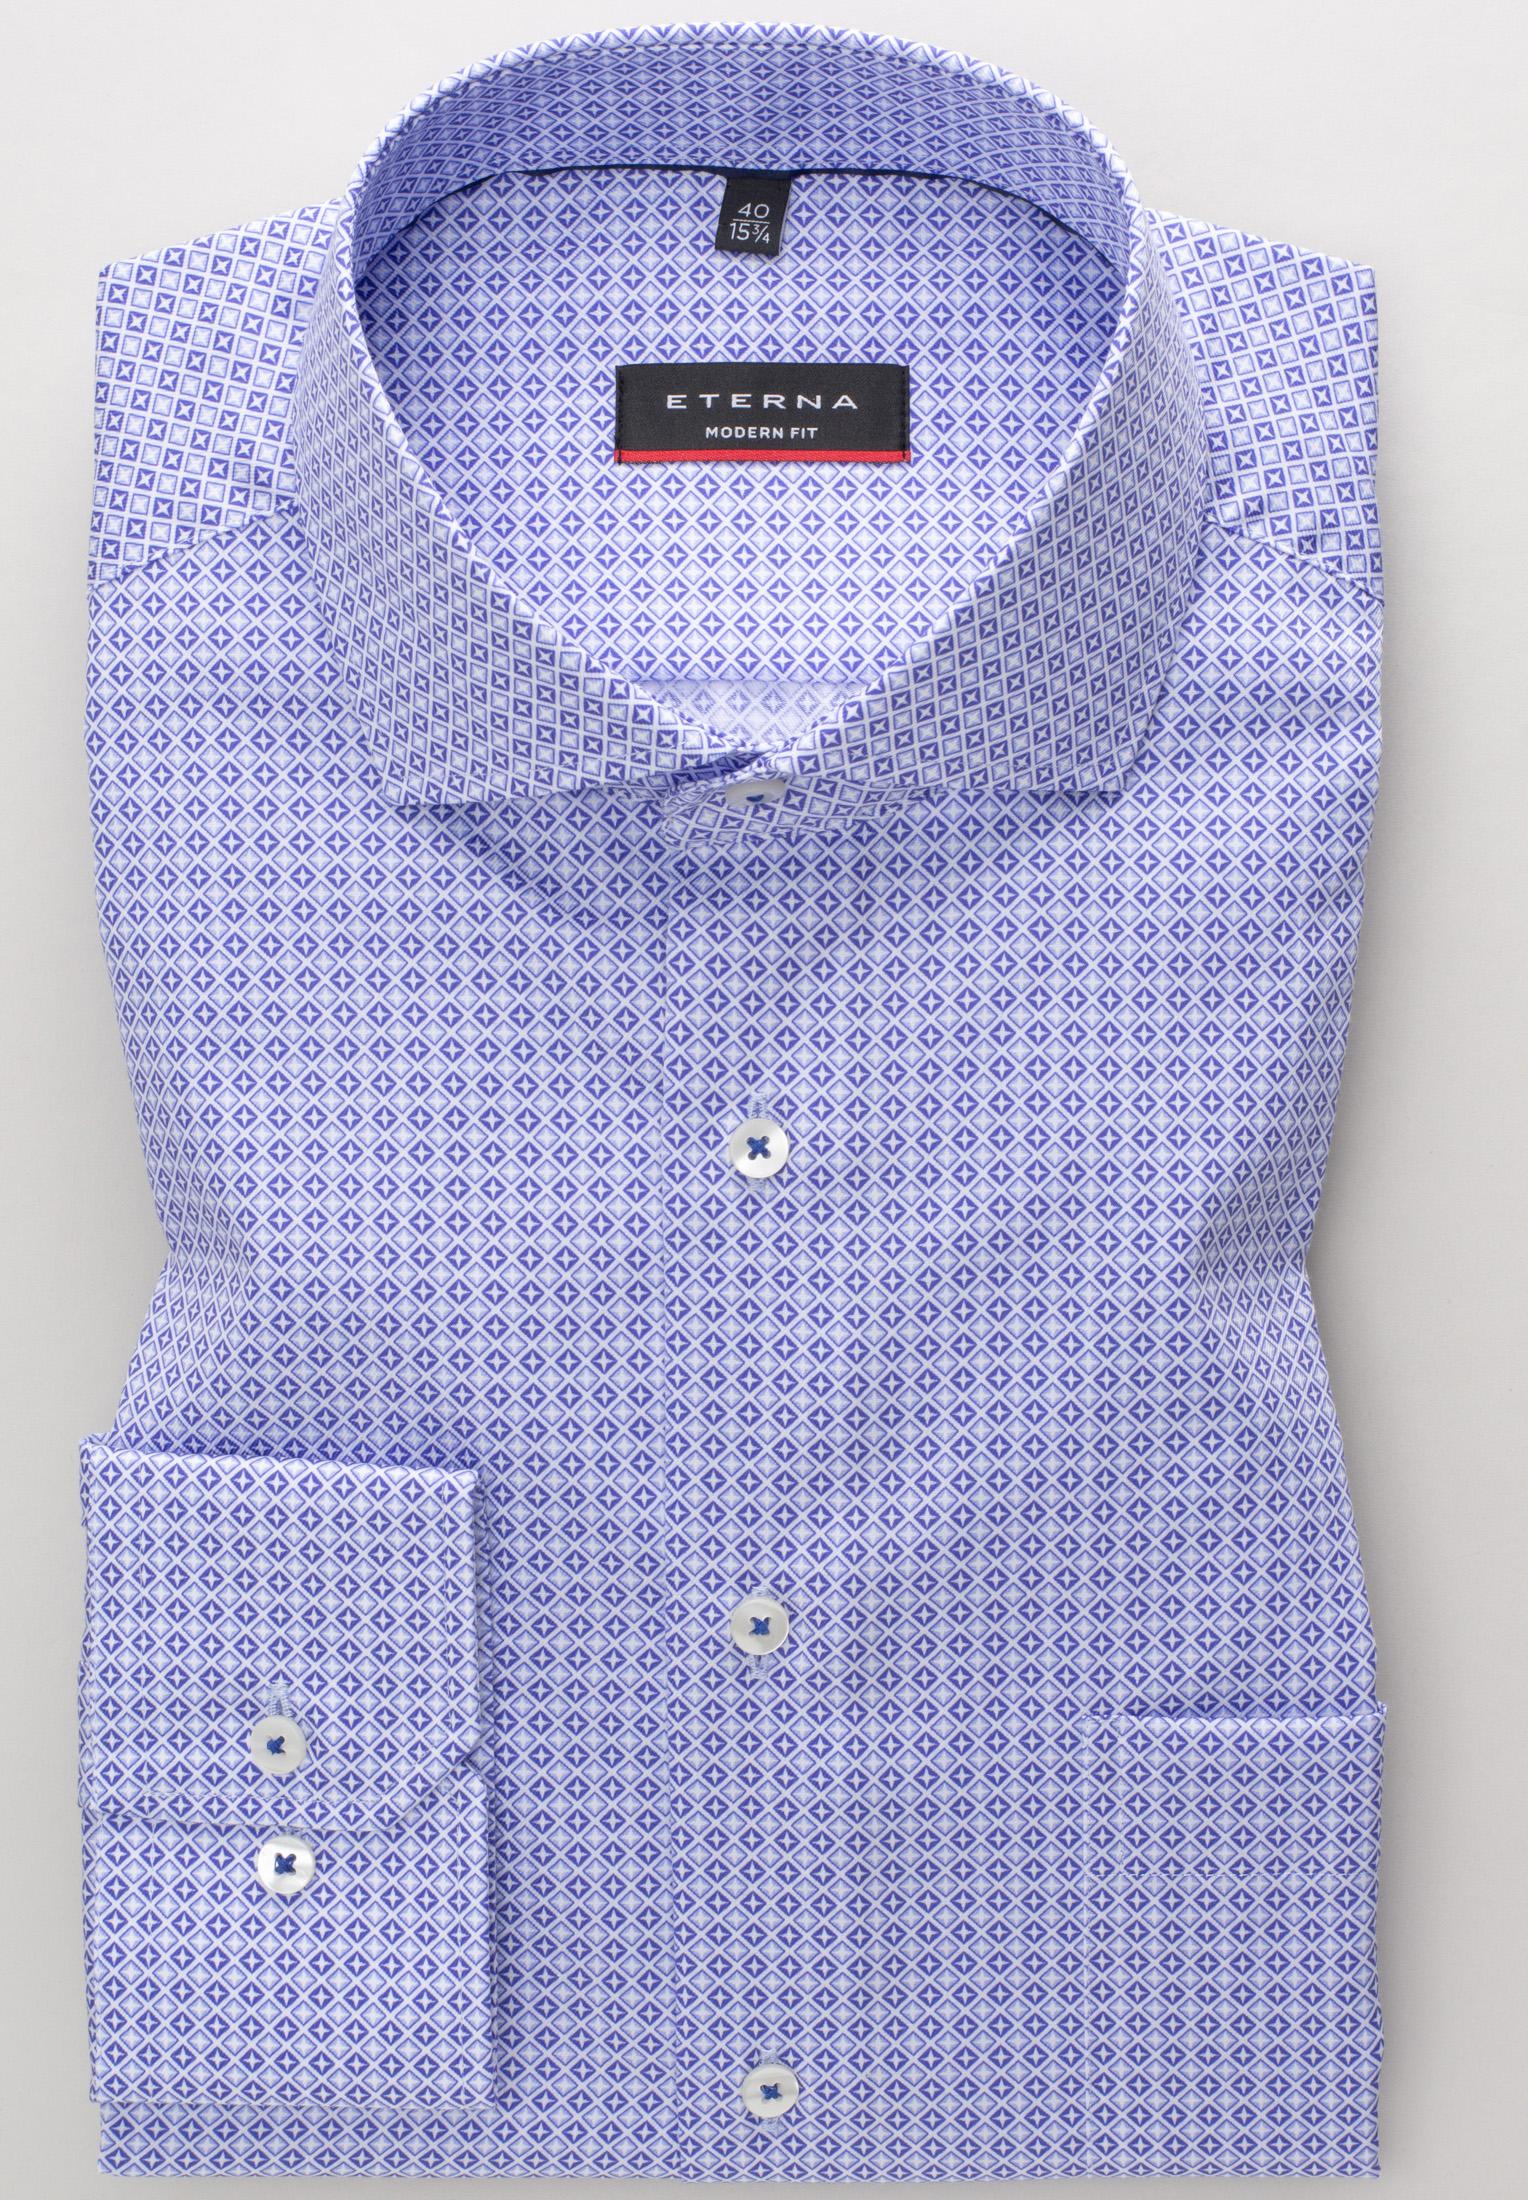 Eterna LS skjorte, modern fit